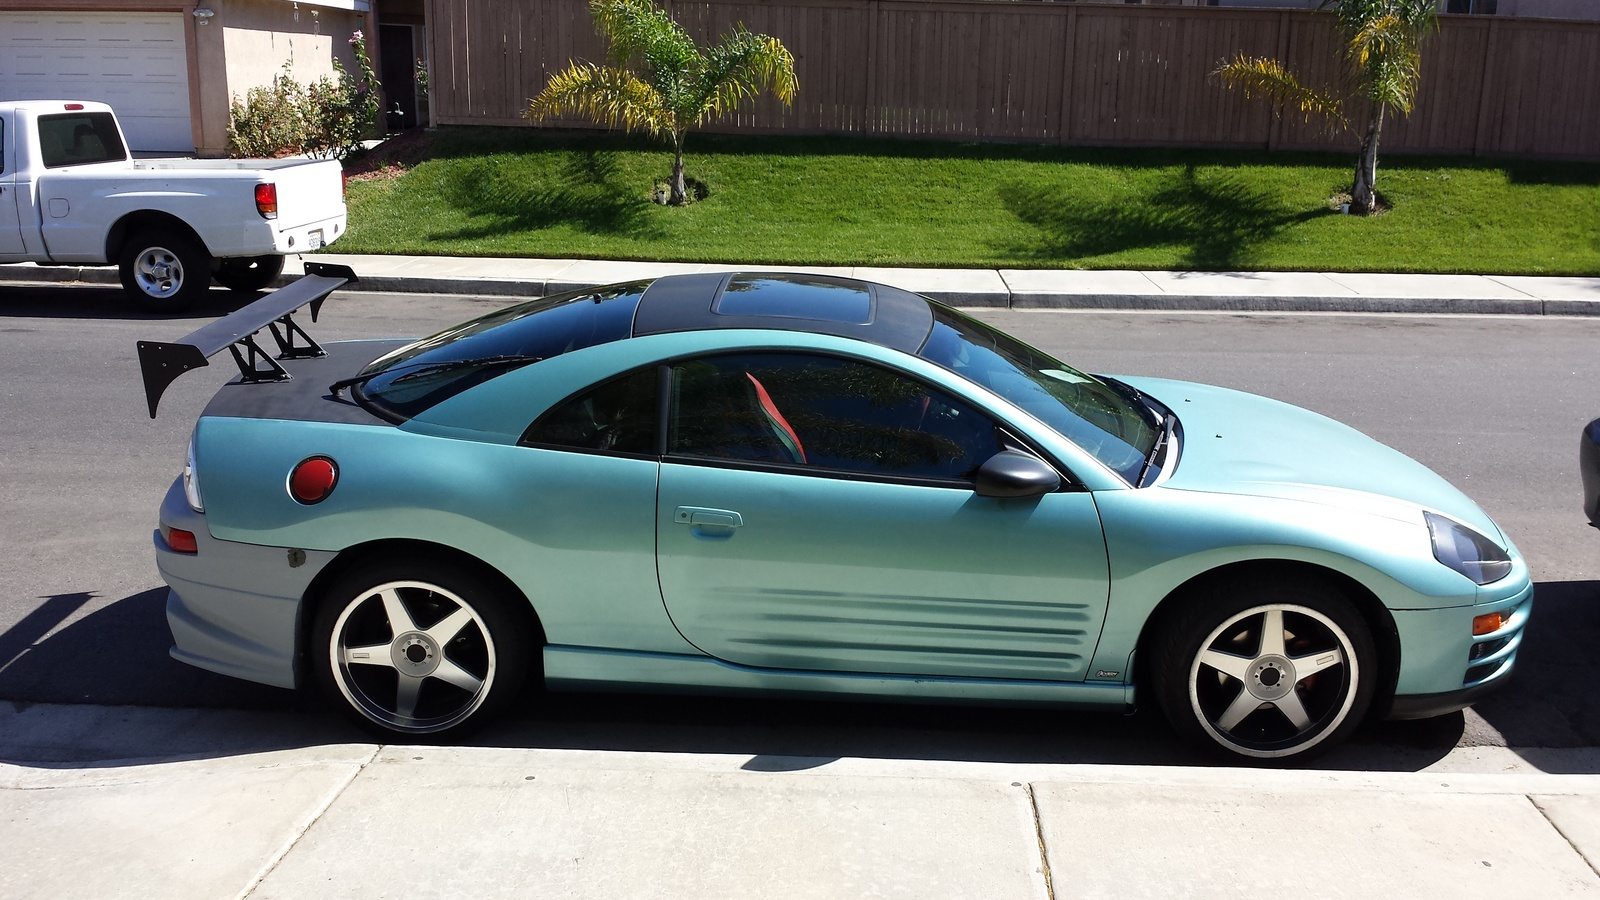 2001 Mitsubishi Eclipse - Overview